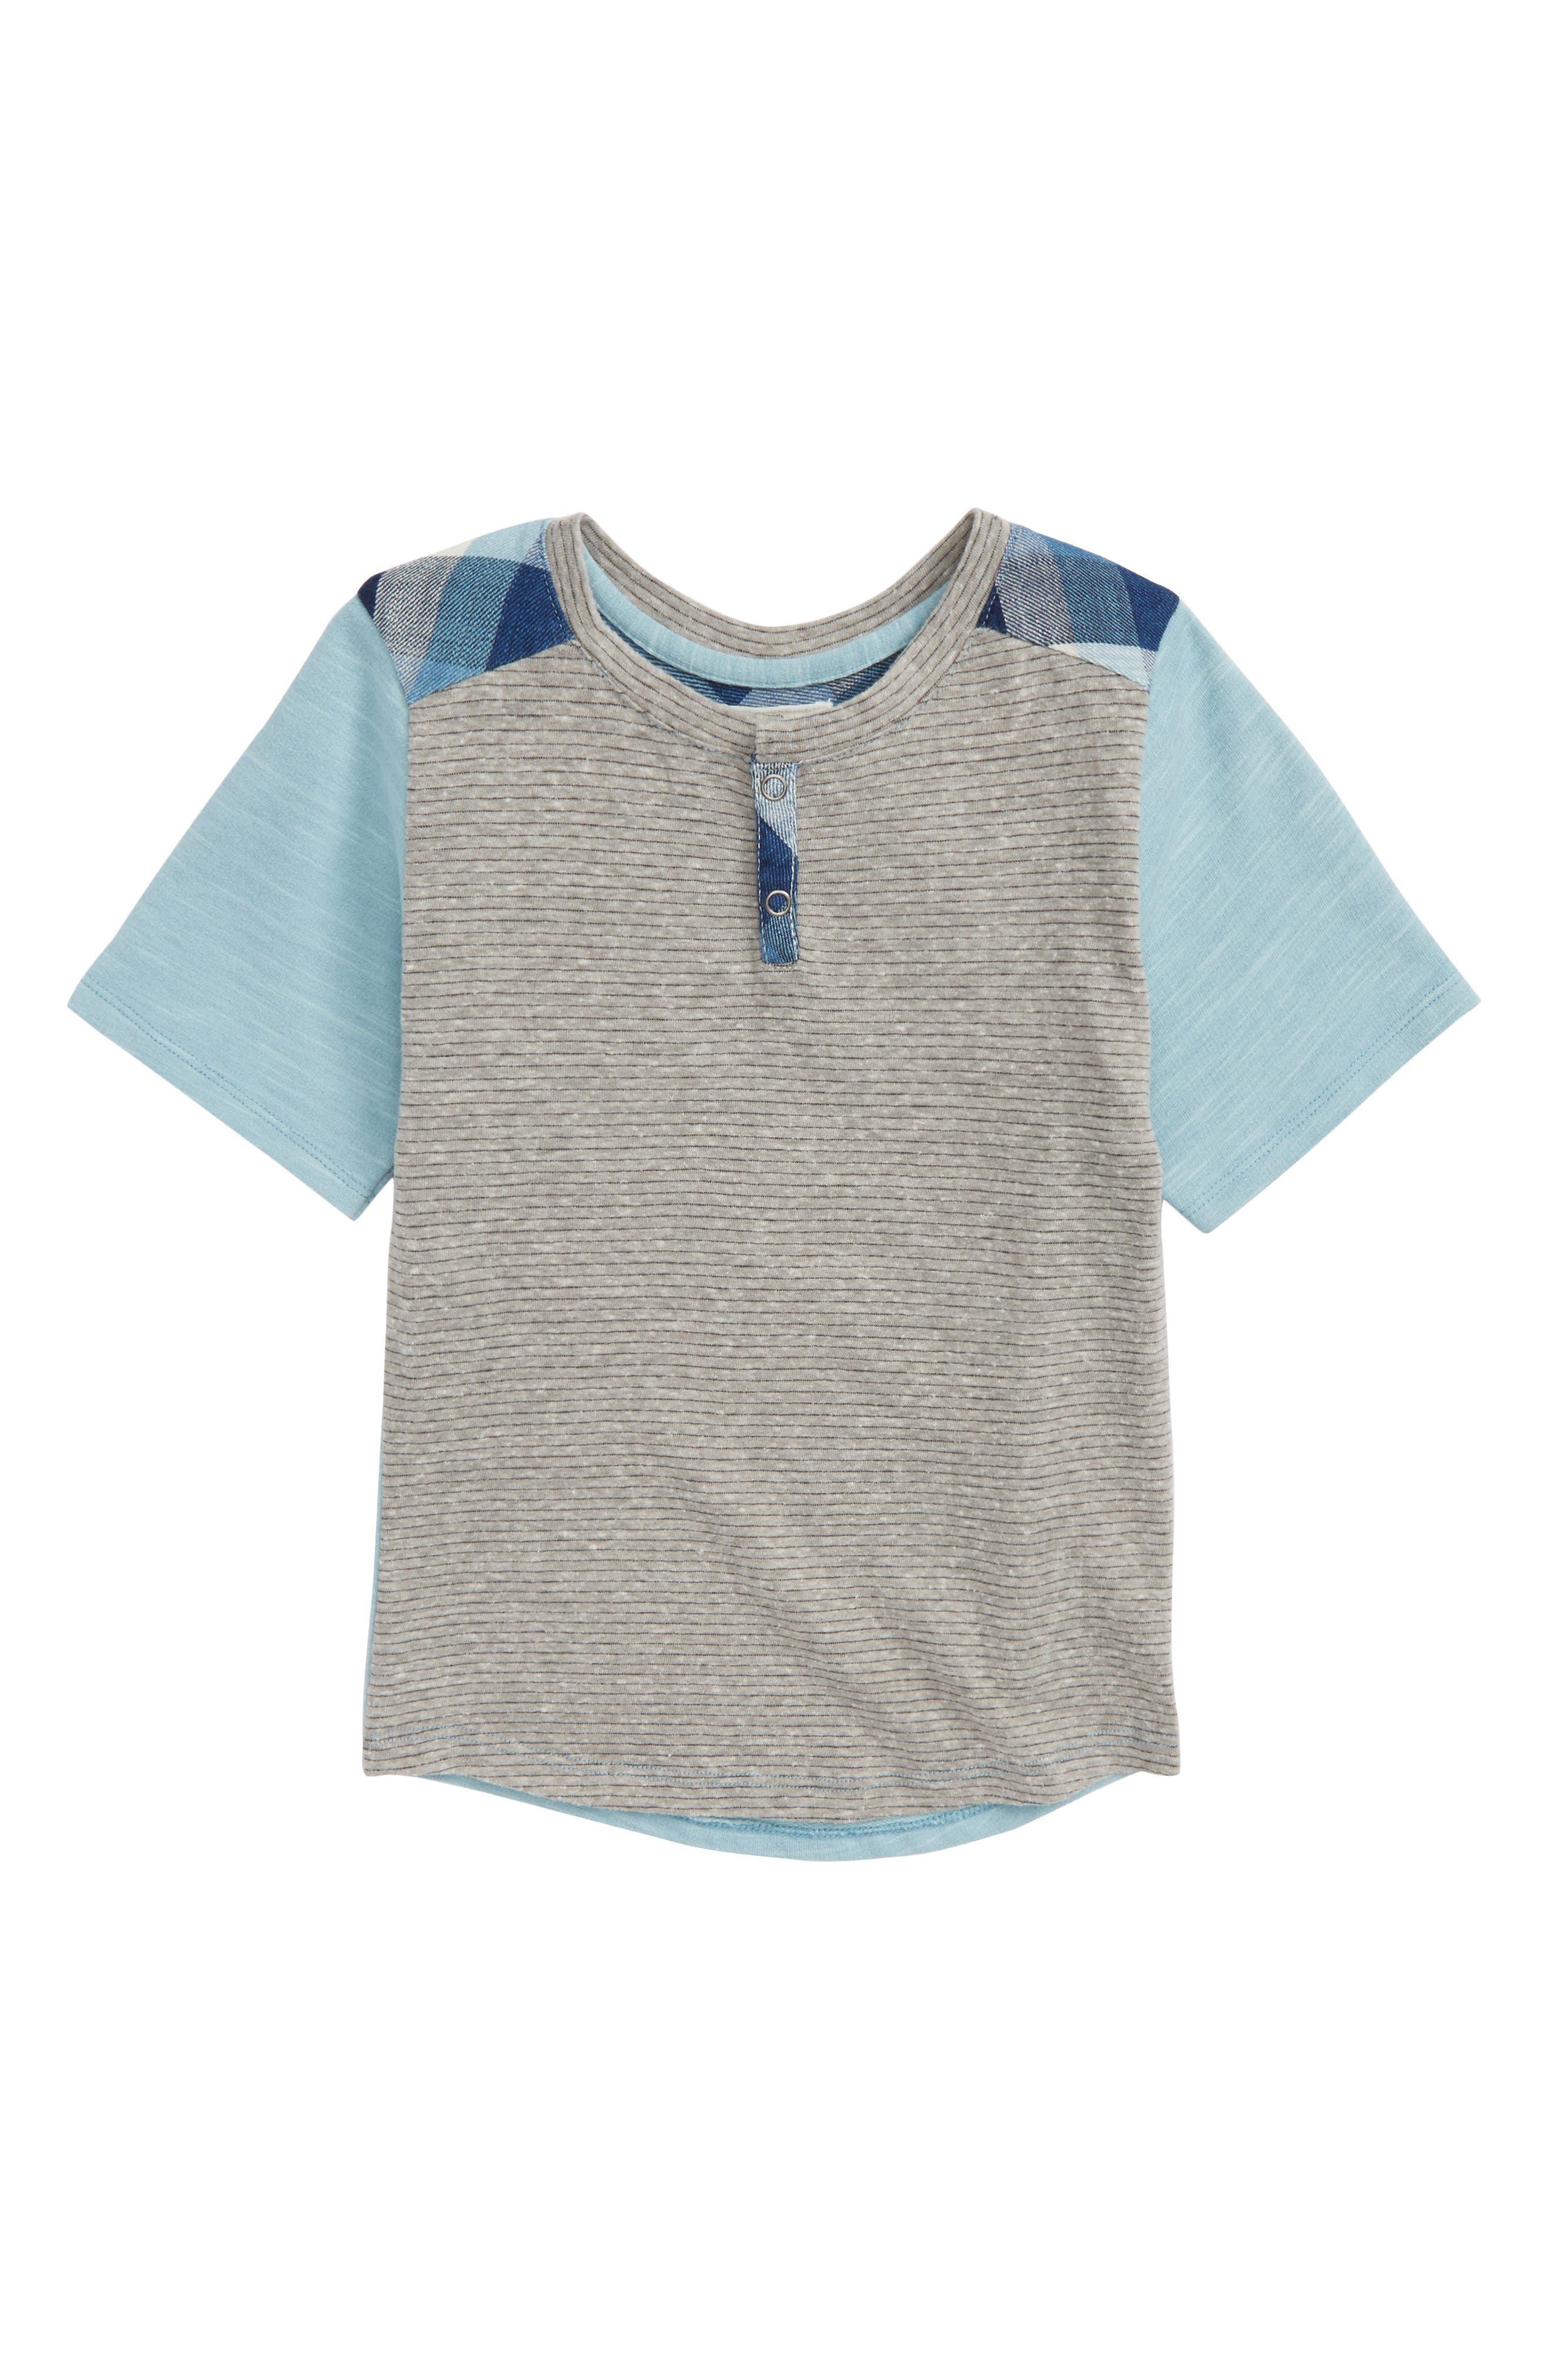 Phoenix Henley Shirt,                             Main thumbnail 1, color,                             020